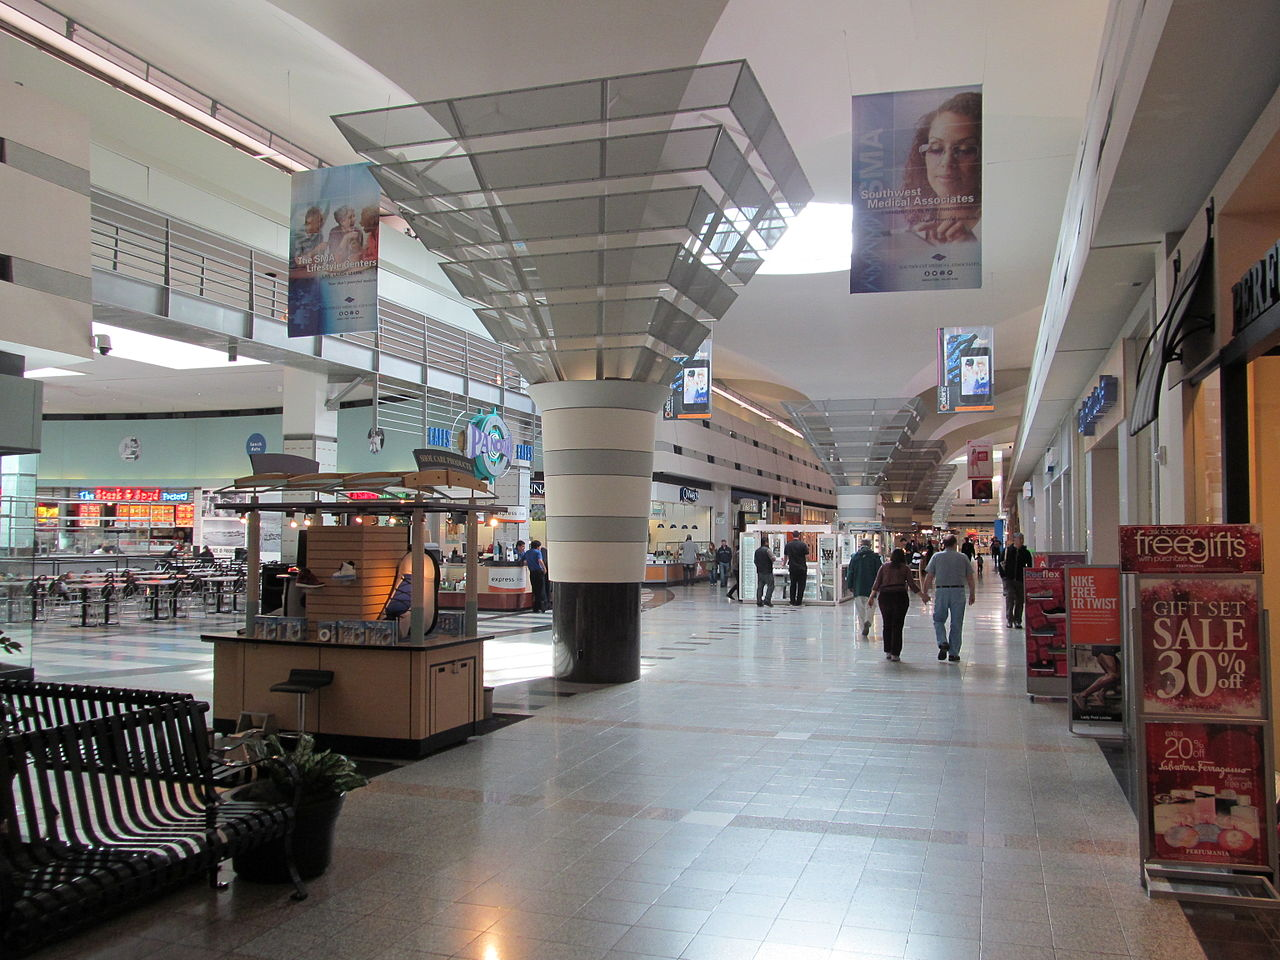 FileThe Boulevard Mall Paradise NVjpg Wikimedia Commons